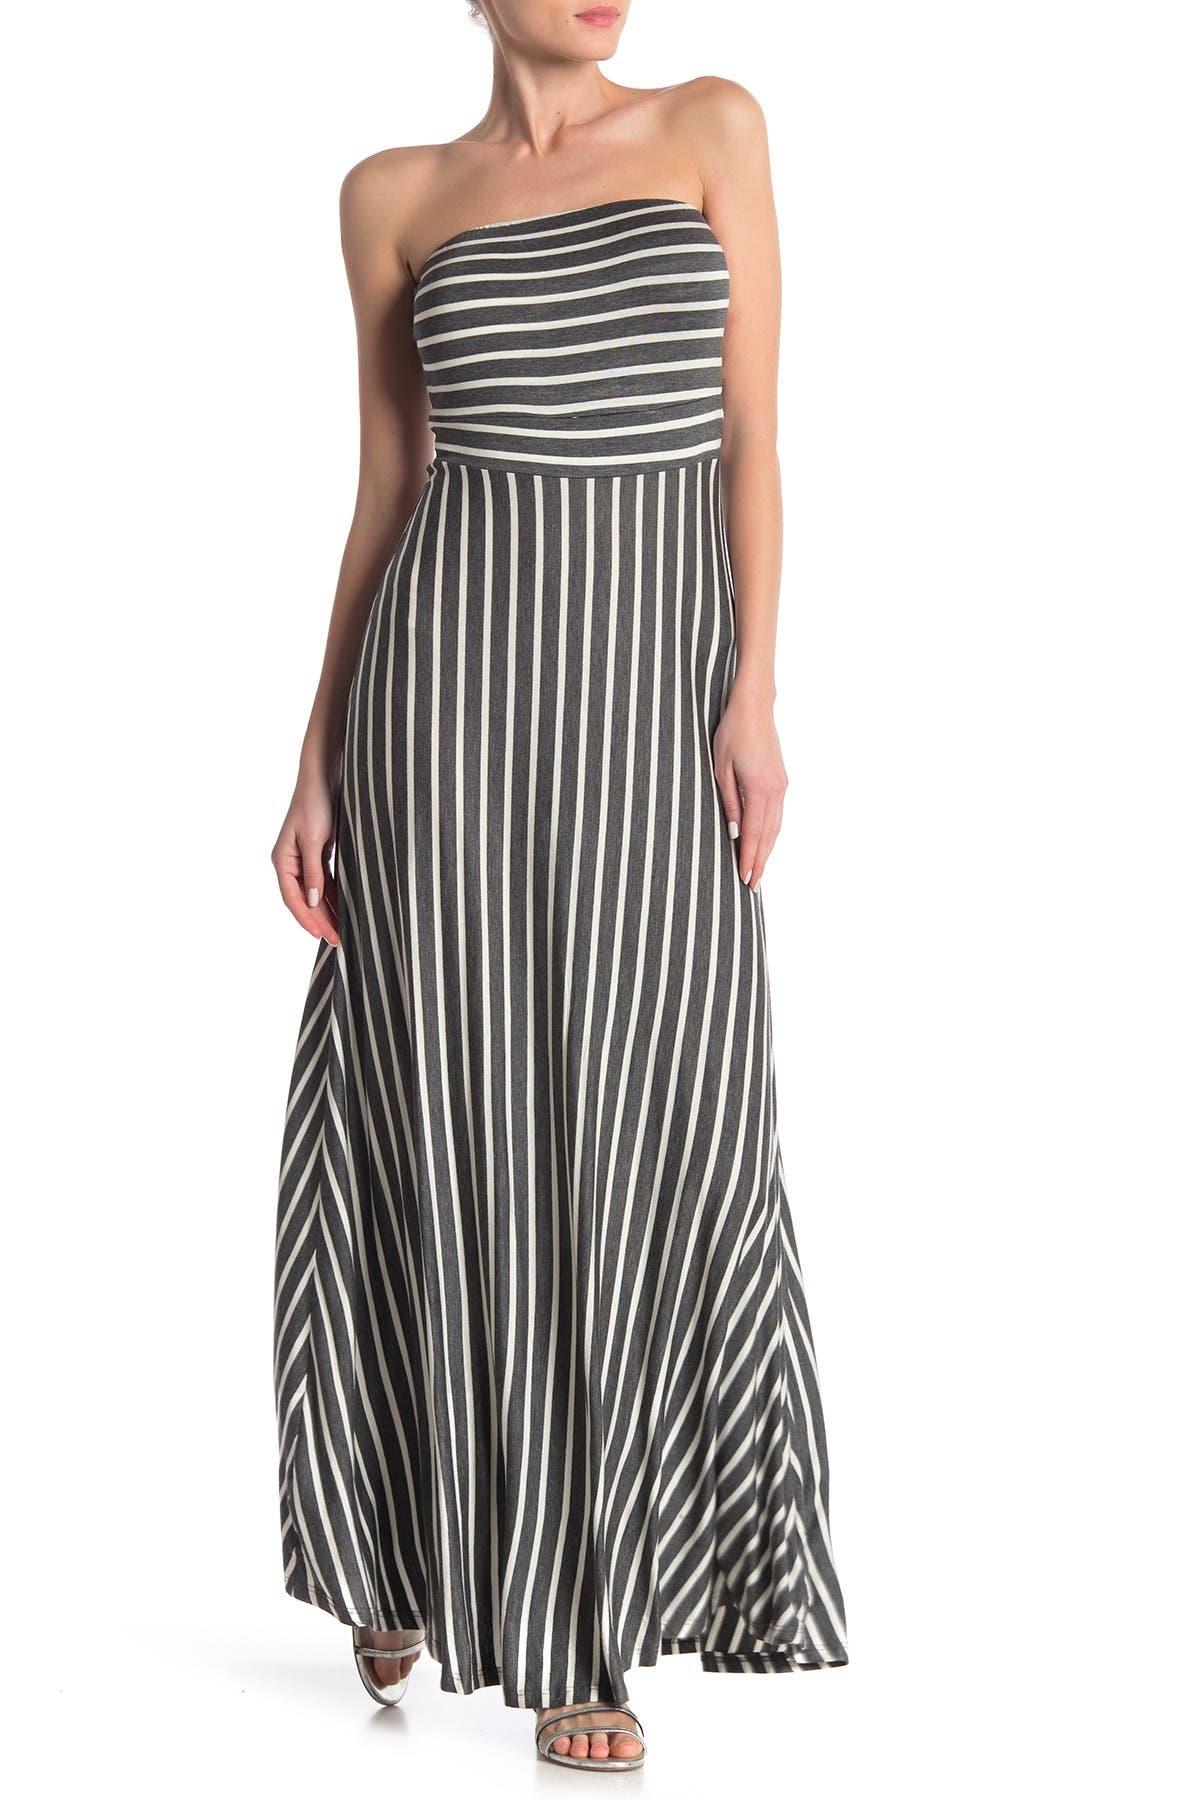 Image of WEST KEI Strapless Stripe Maxi Dress